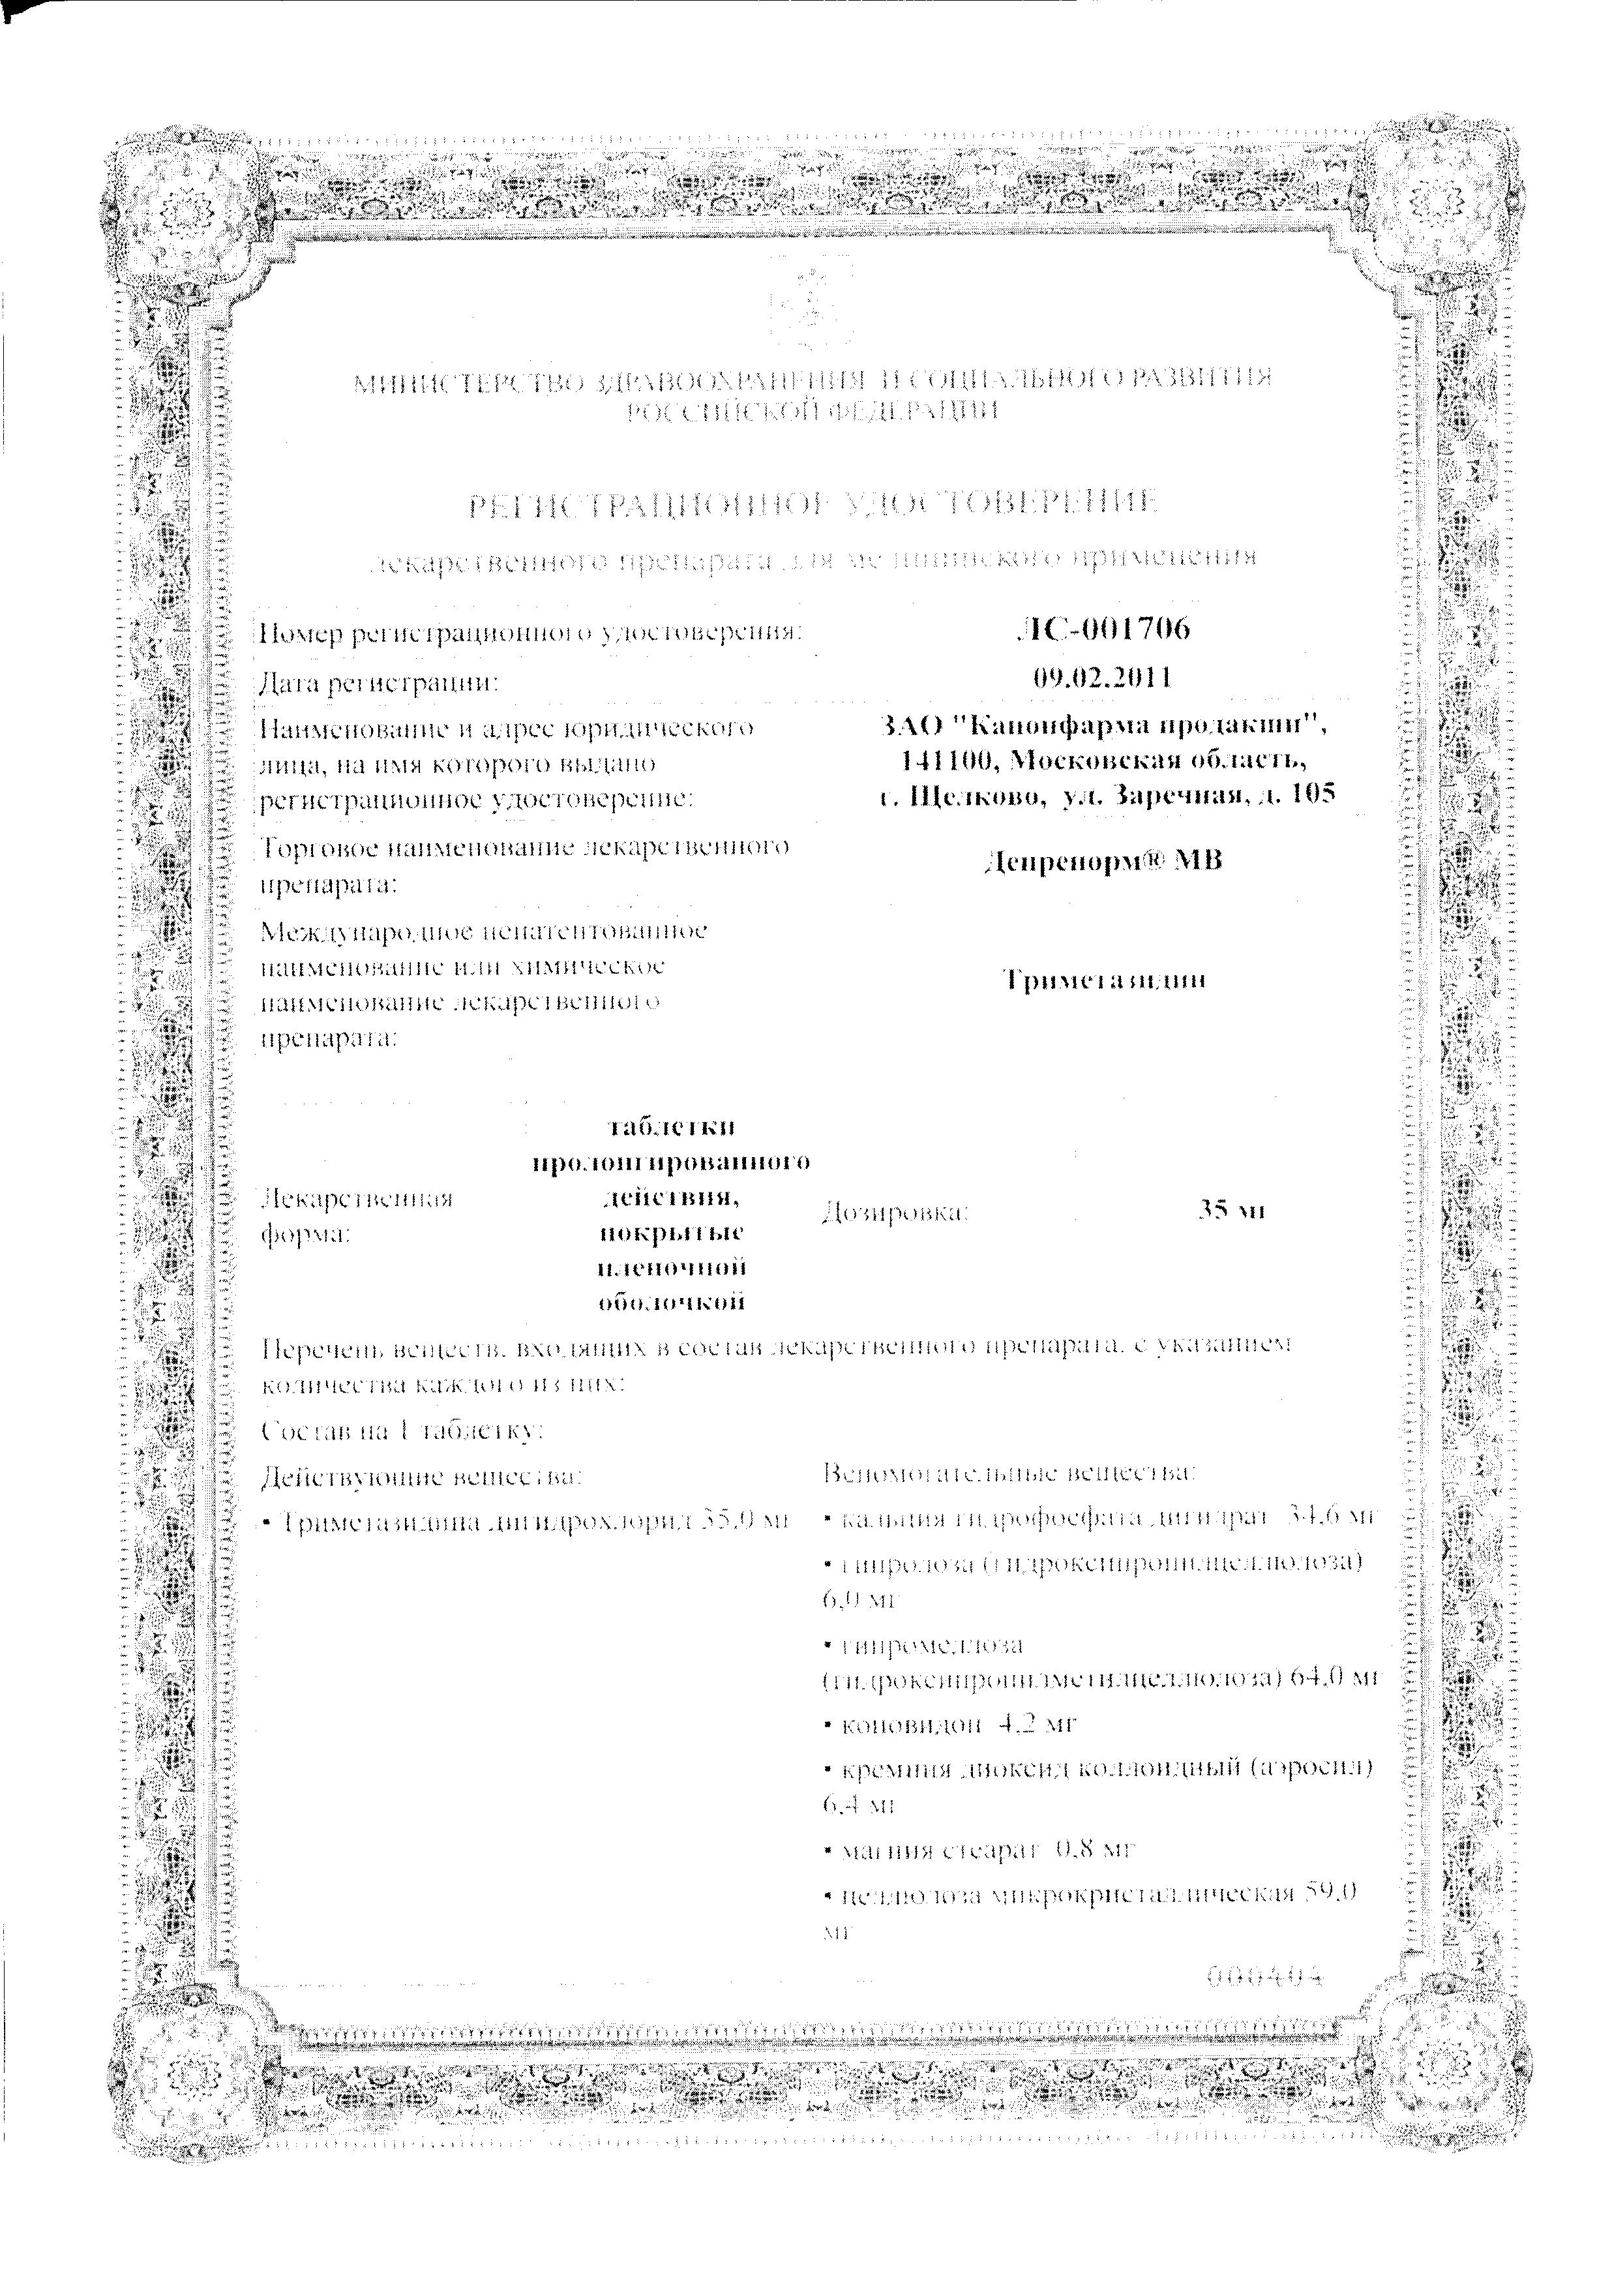 Депренорм МВ сертификат